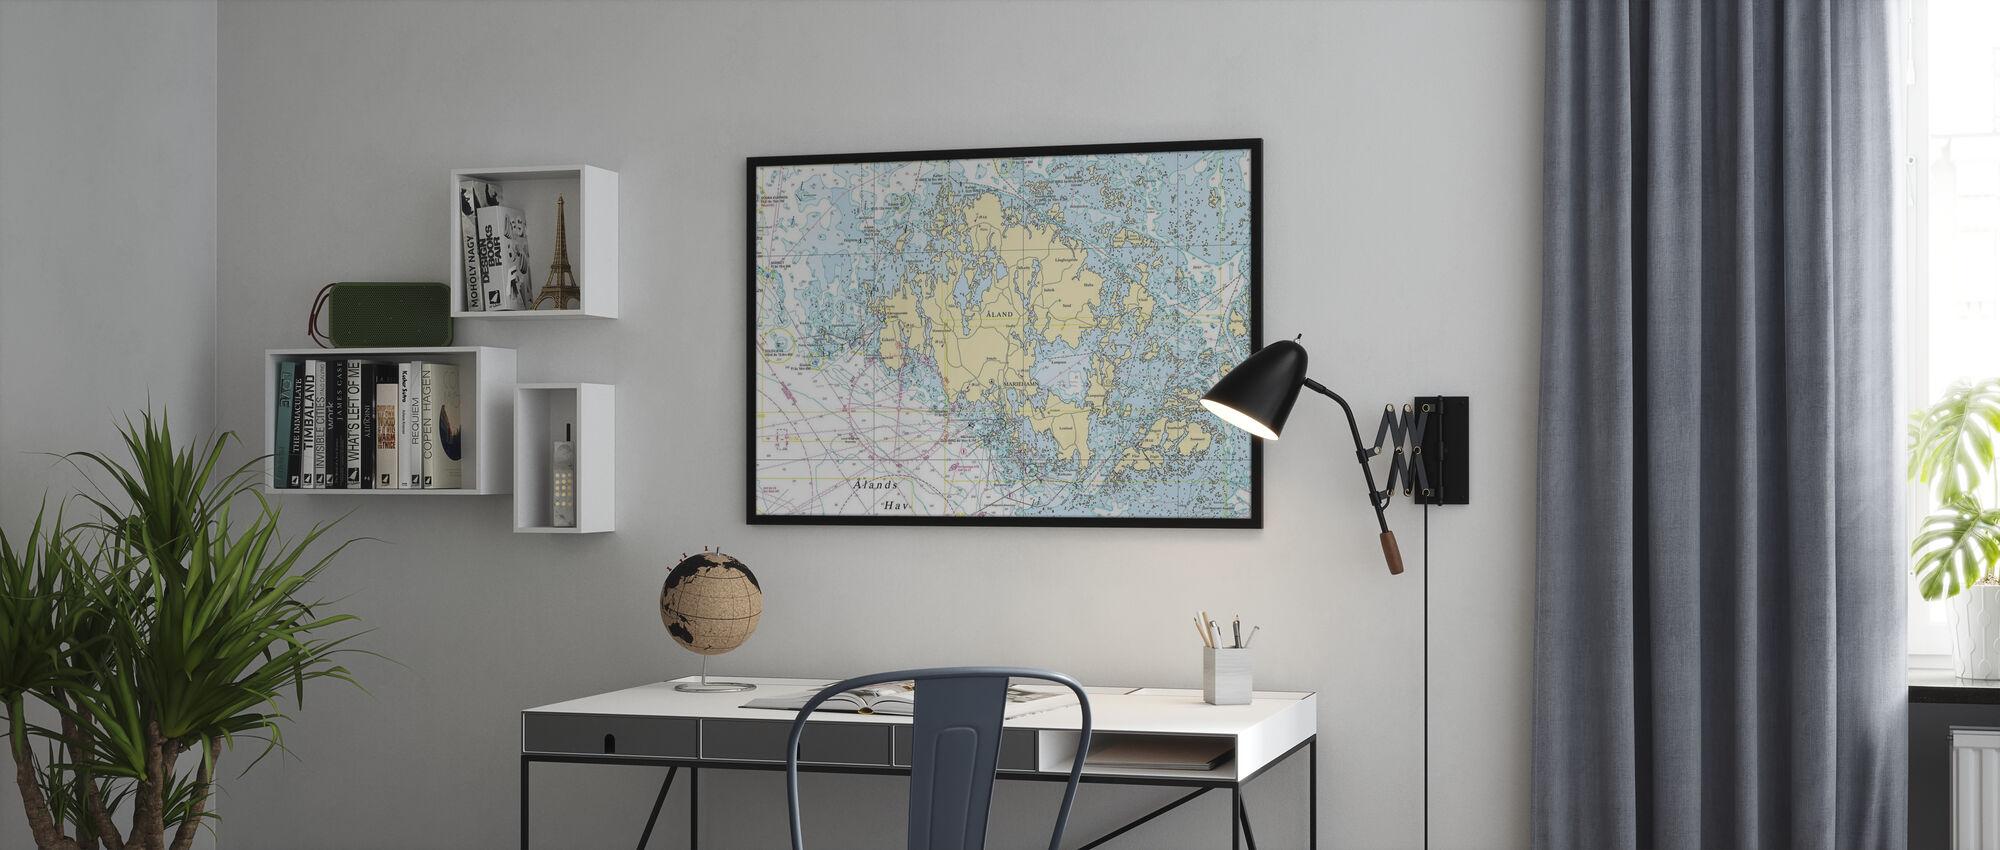 Aland Archipelago - Poster - Office